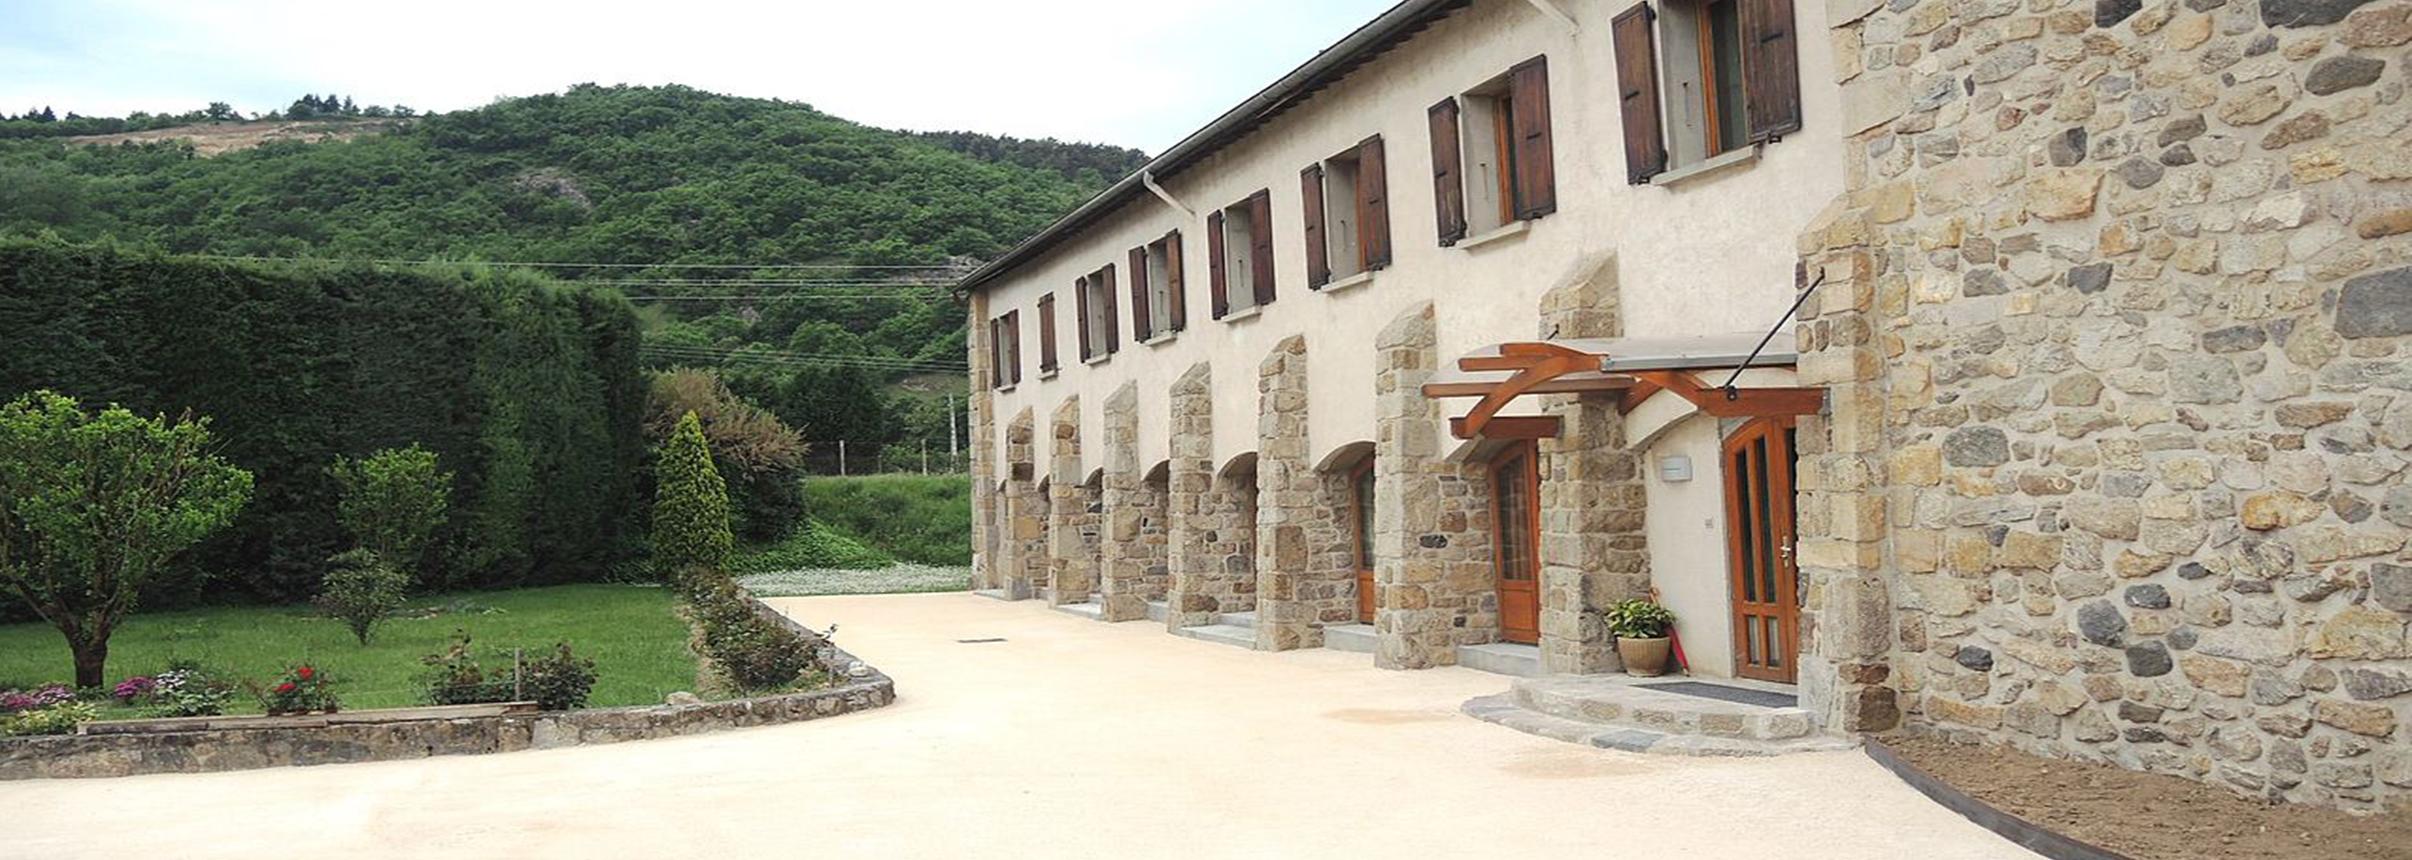 Salle sainte Marie - Abbaye saint Pierre